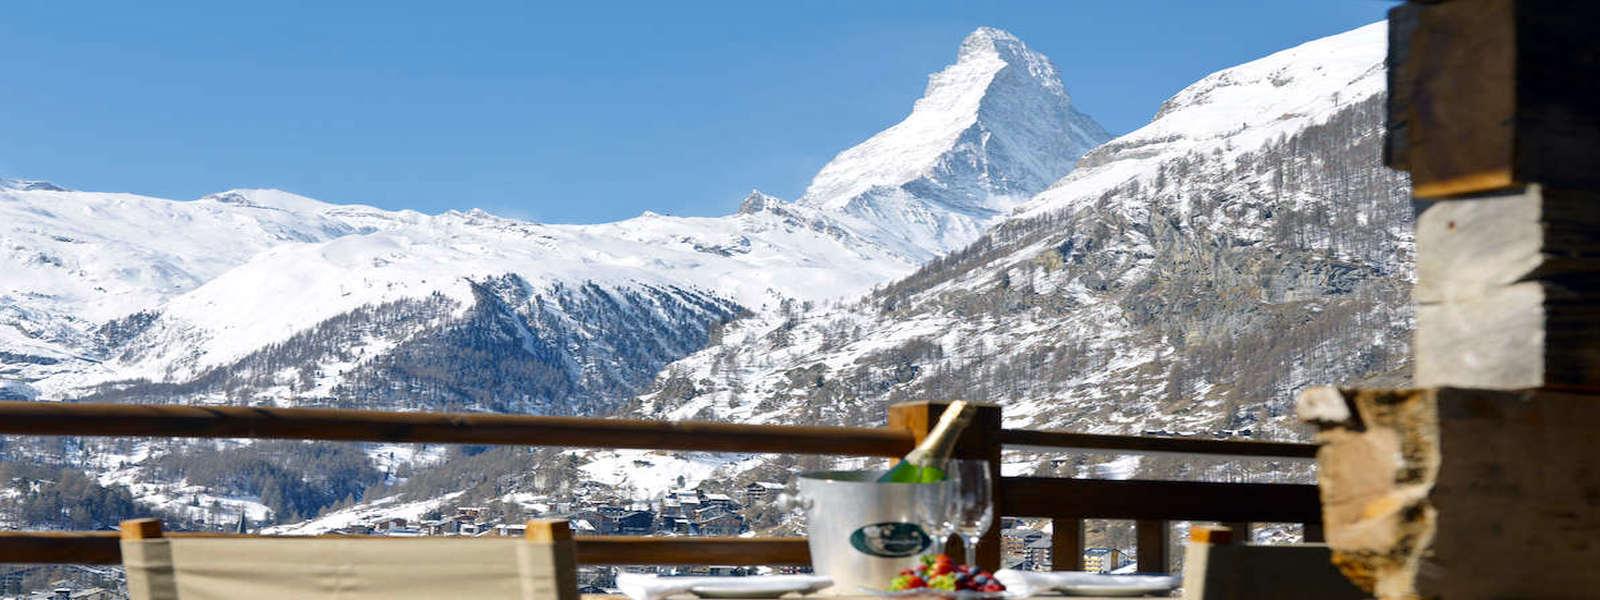 Luxury Chalet in Zermatt for Rent with Matterhorn view